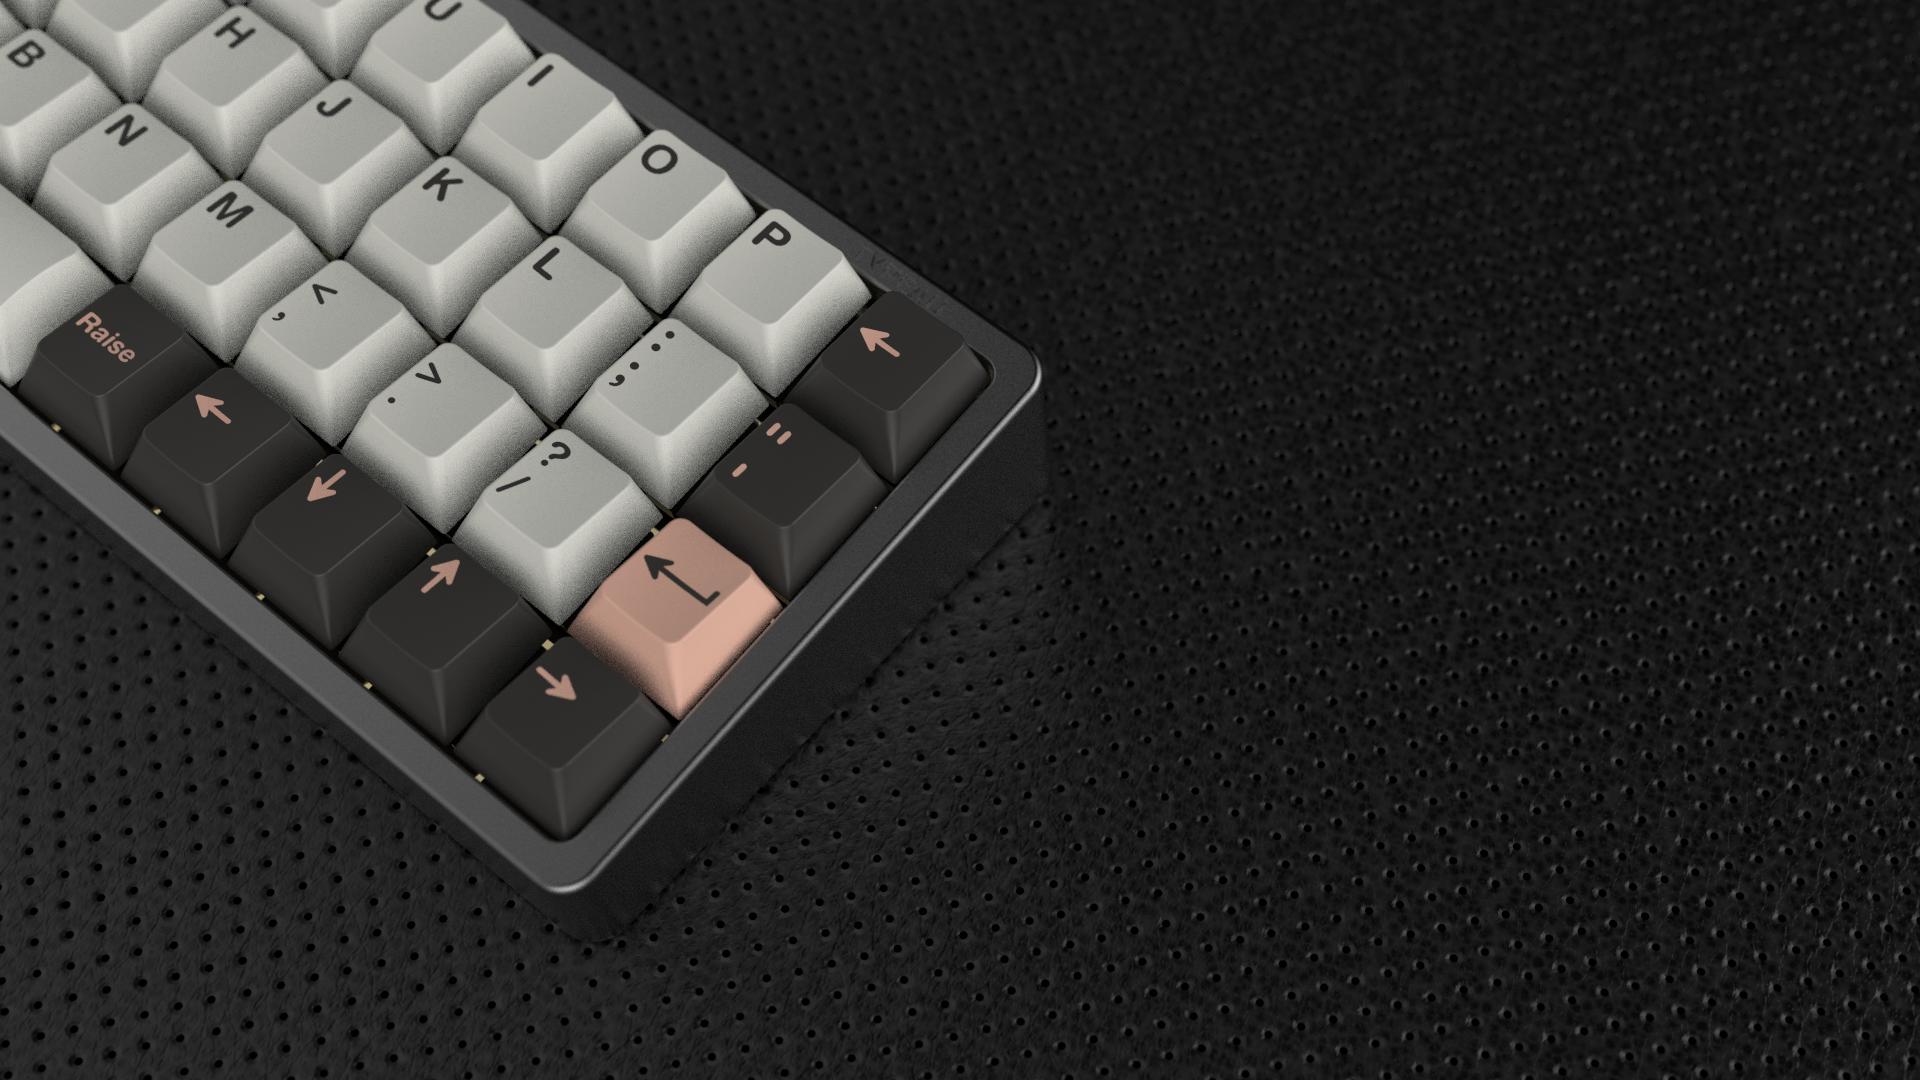 Space Gray Typeau Planck keyboard render with GMK Olivia keycaps